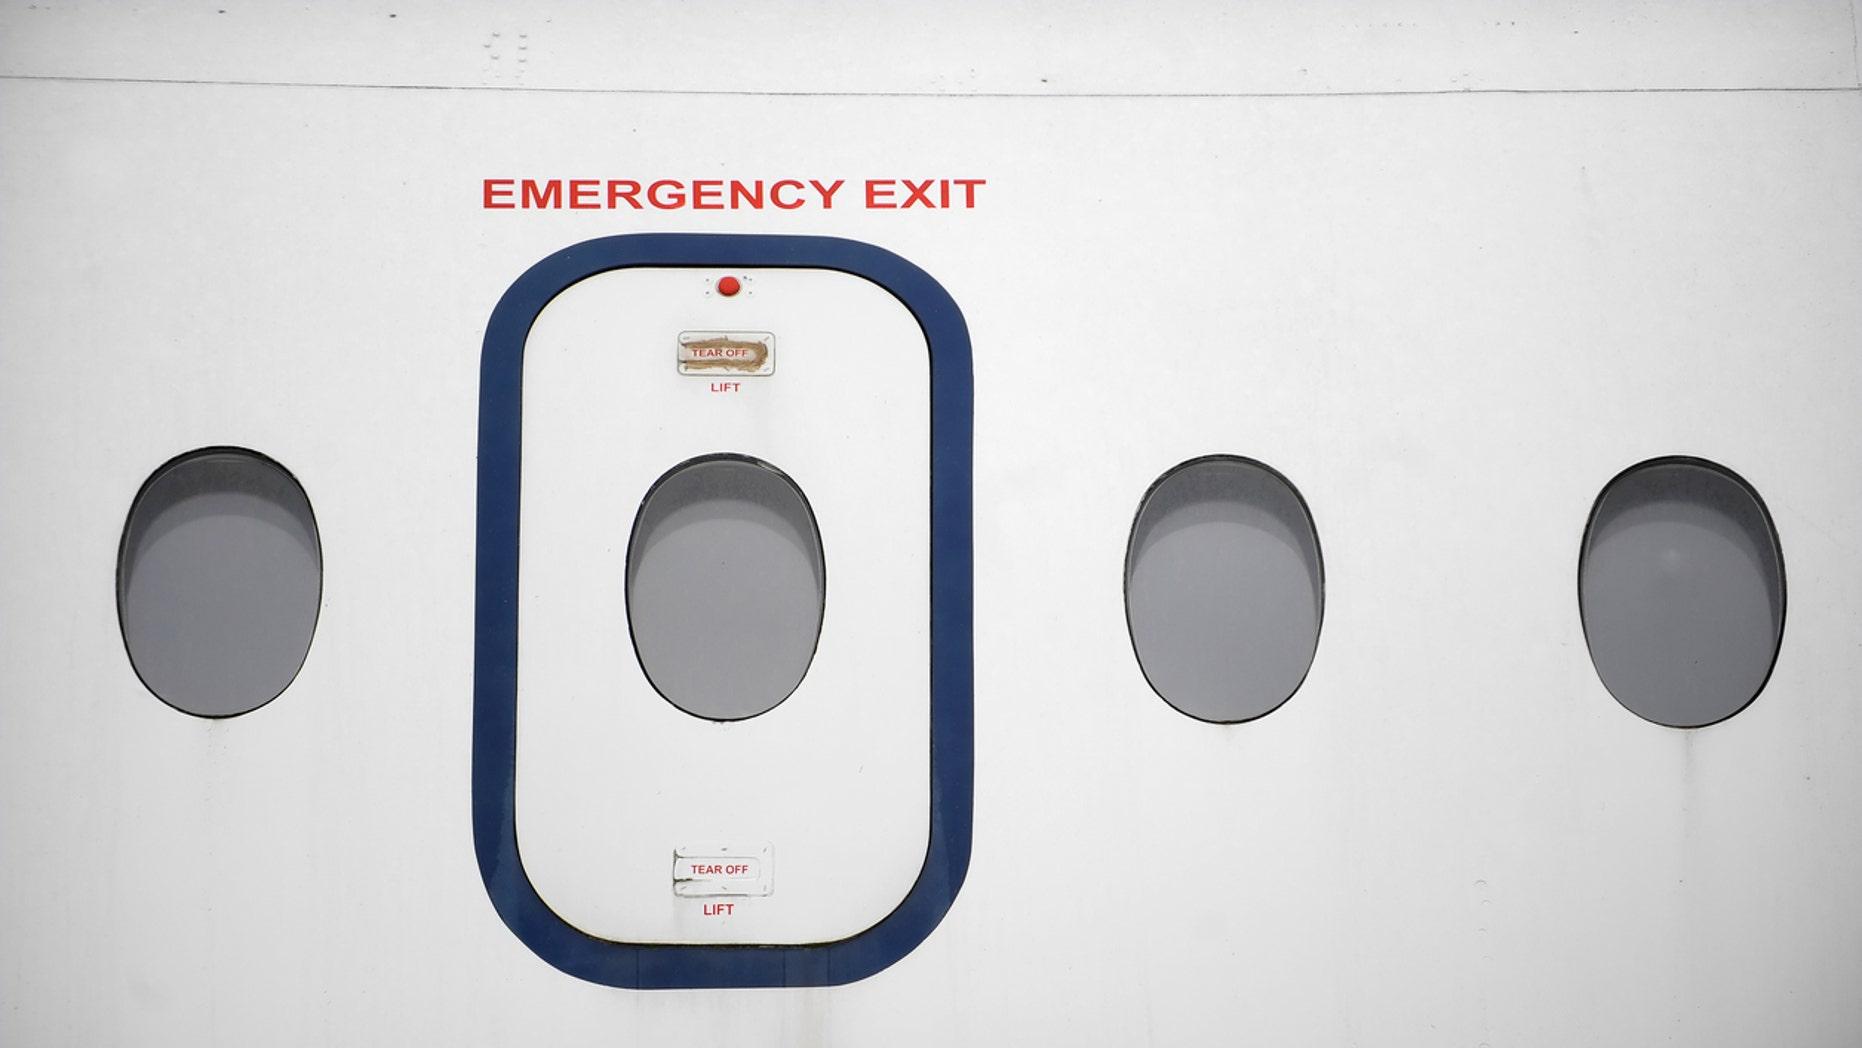 Airline Blames Passengers After Emergency Exit Door Falls Off Plane